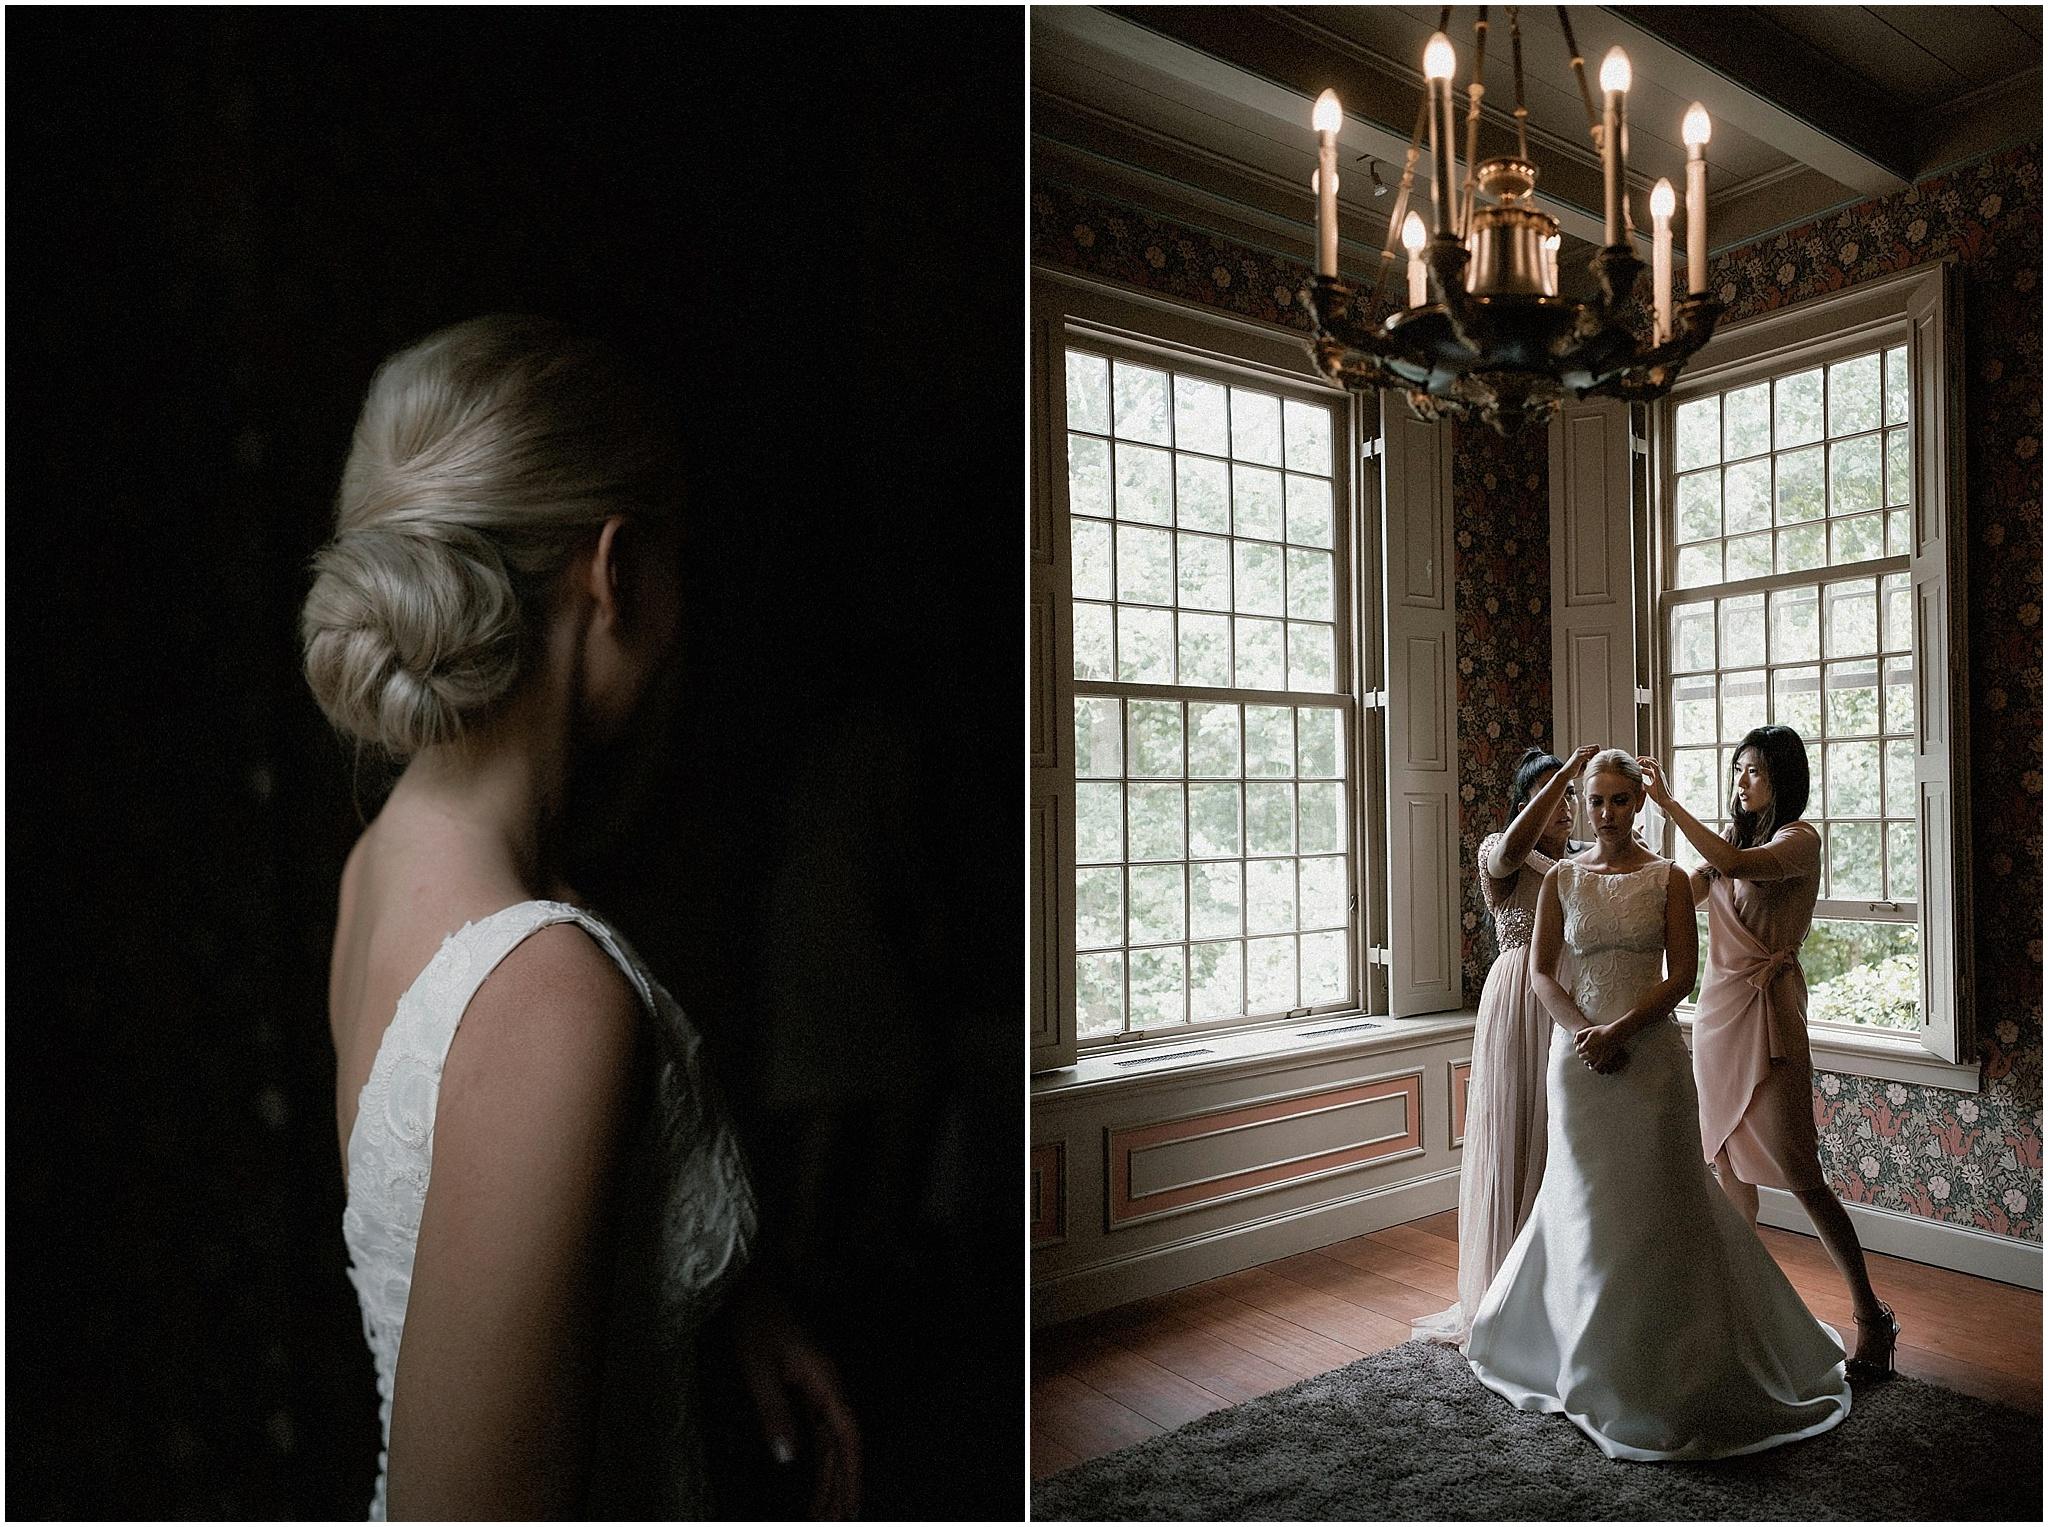 Bruidsfotografie Buitenplaats Sparrendaal - Naomi van der Kraan 0016.jpg